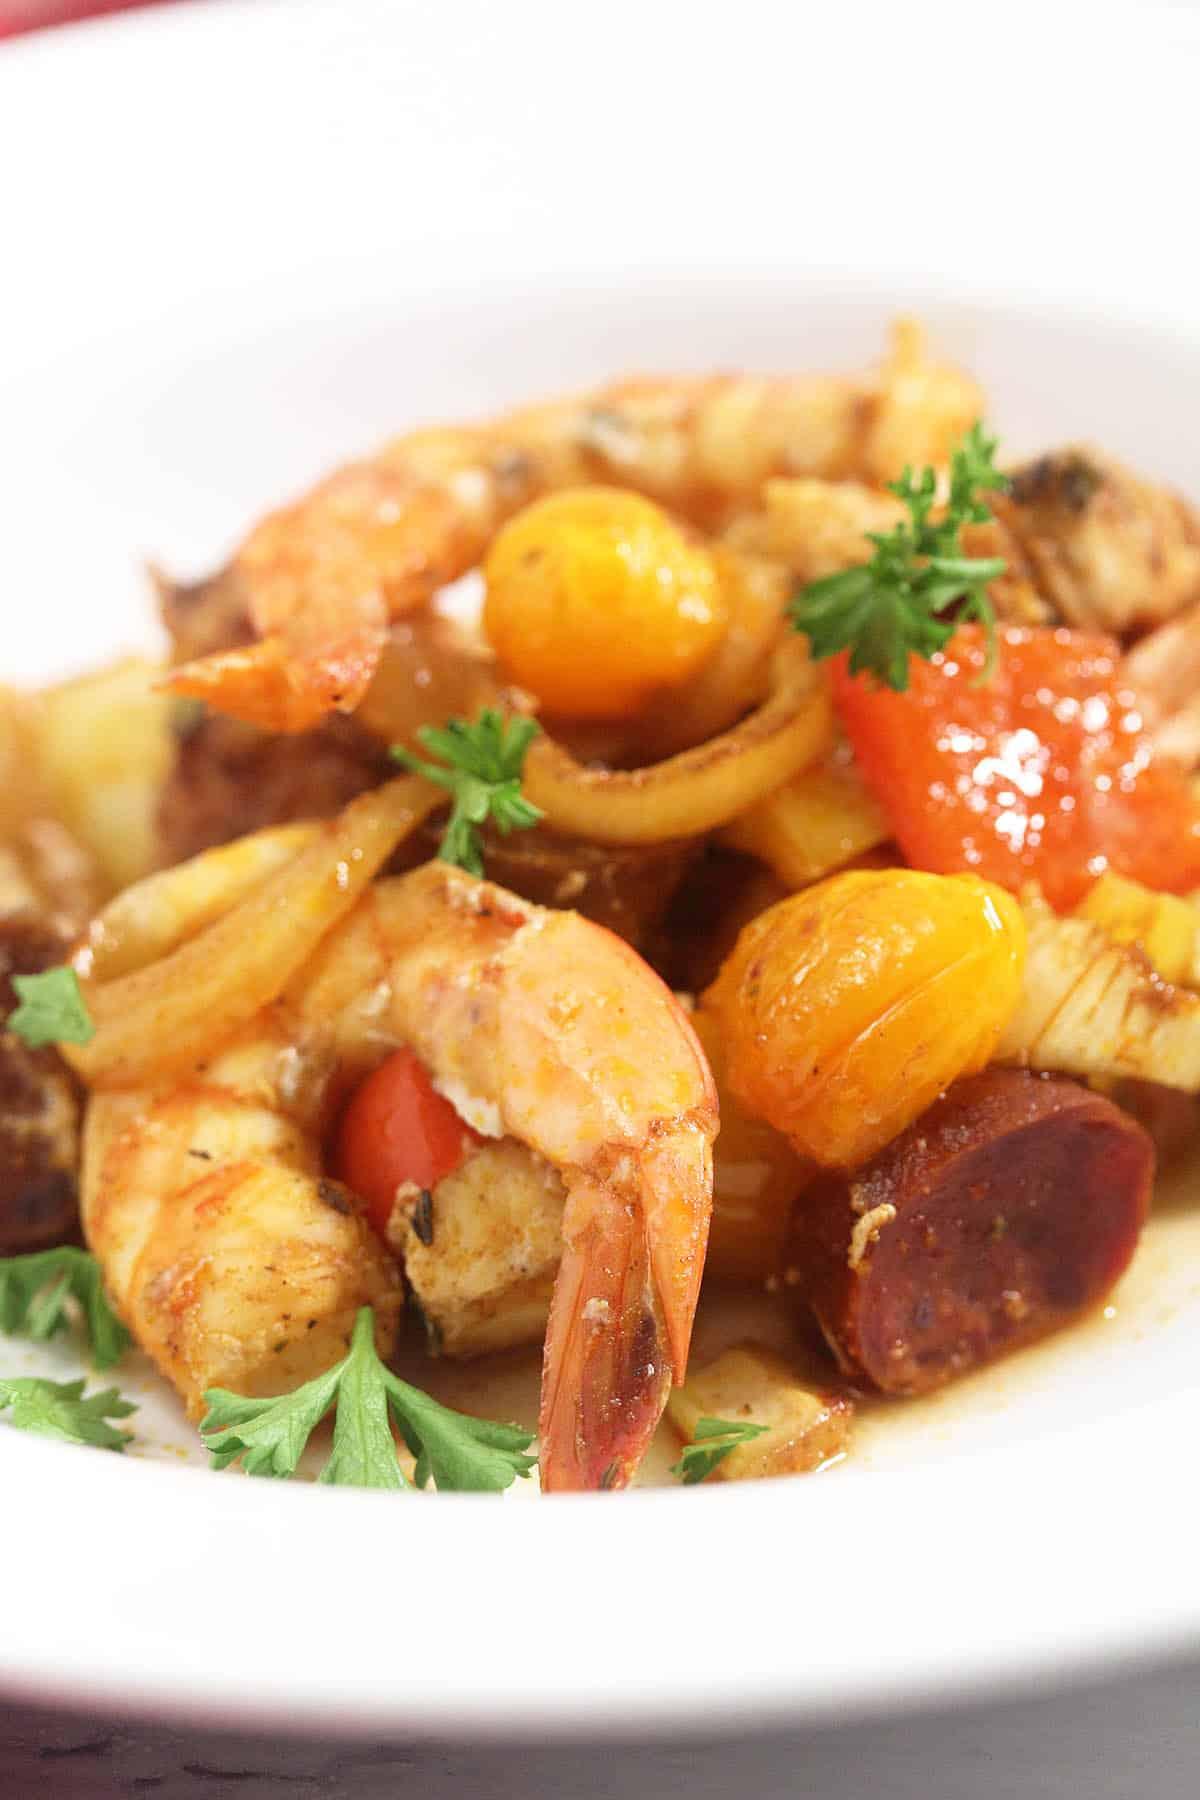 Closeup of plated creole sheet pan dinner.